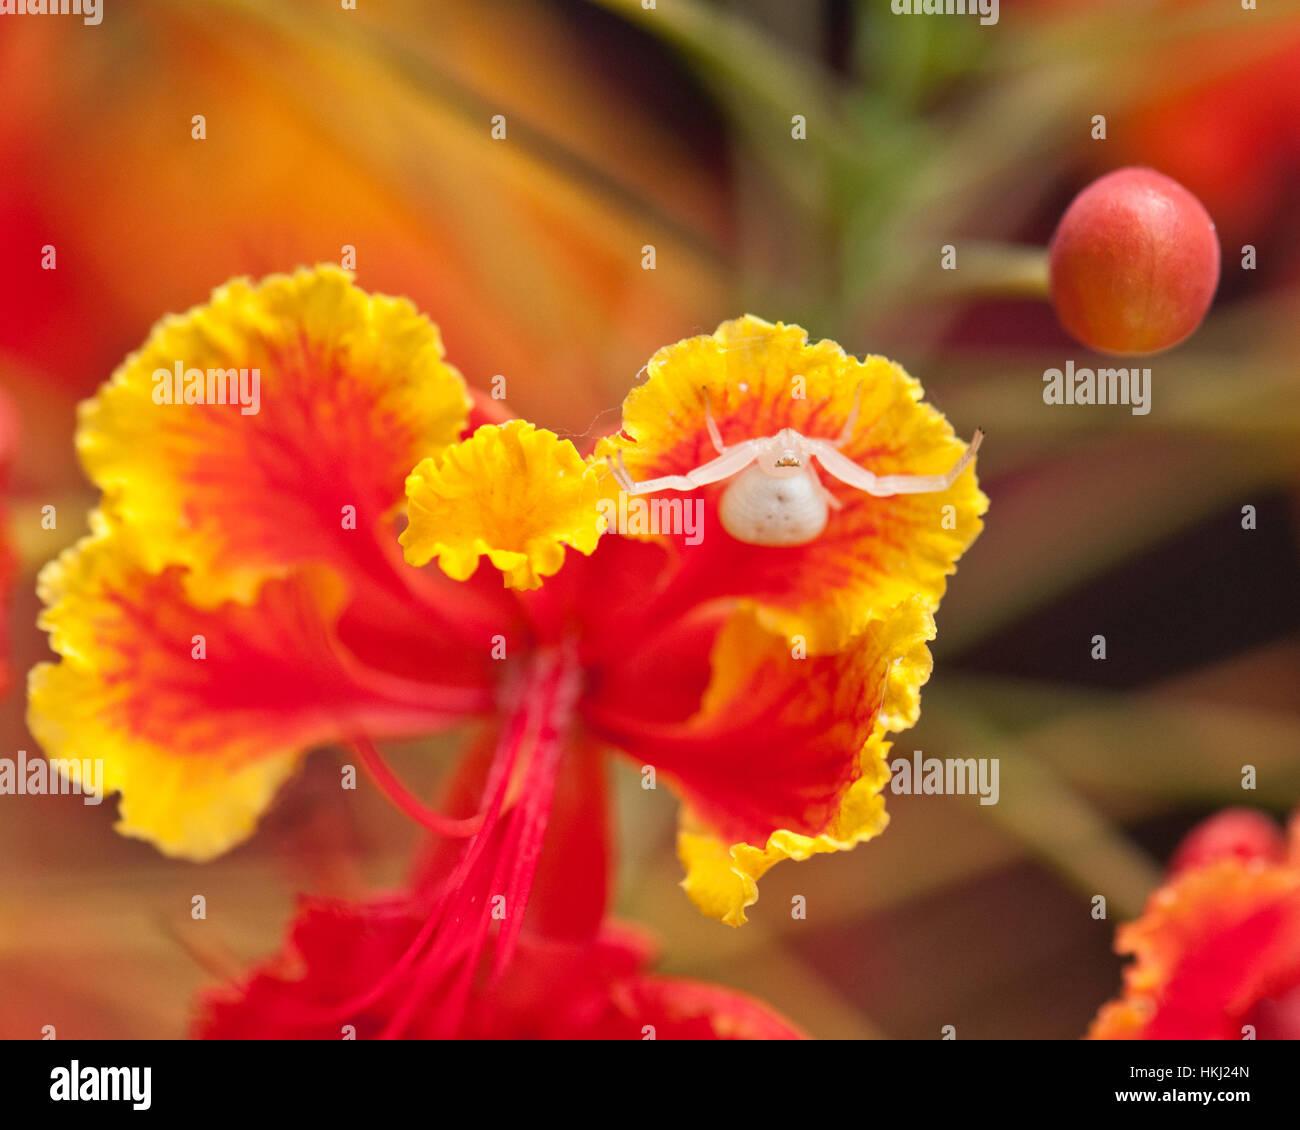 Spider on a Dwarf Poinciana flower. - Stock Image